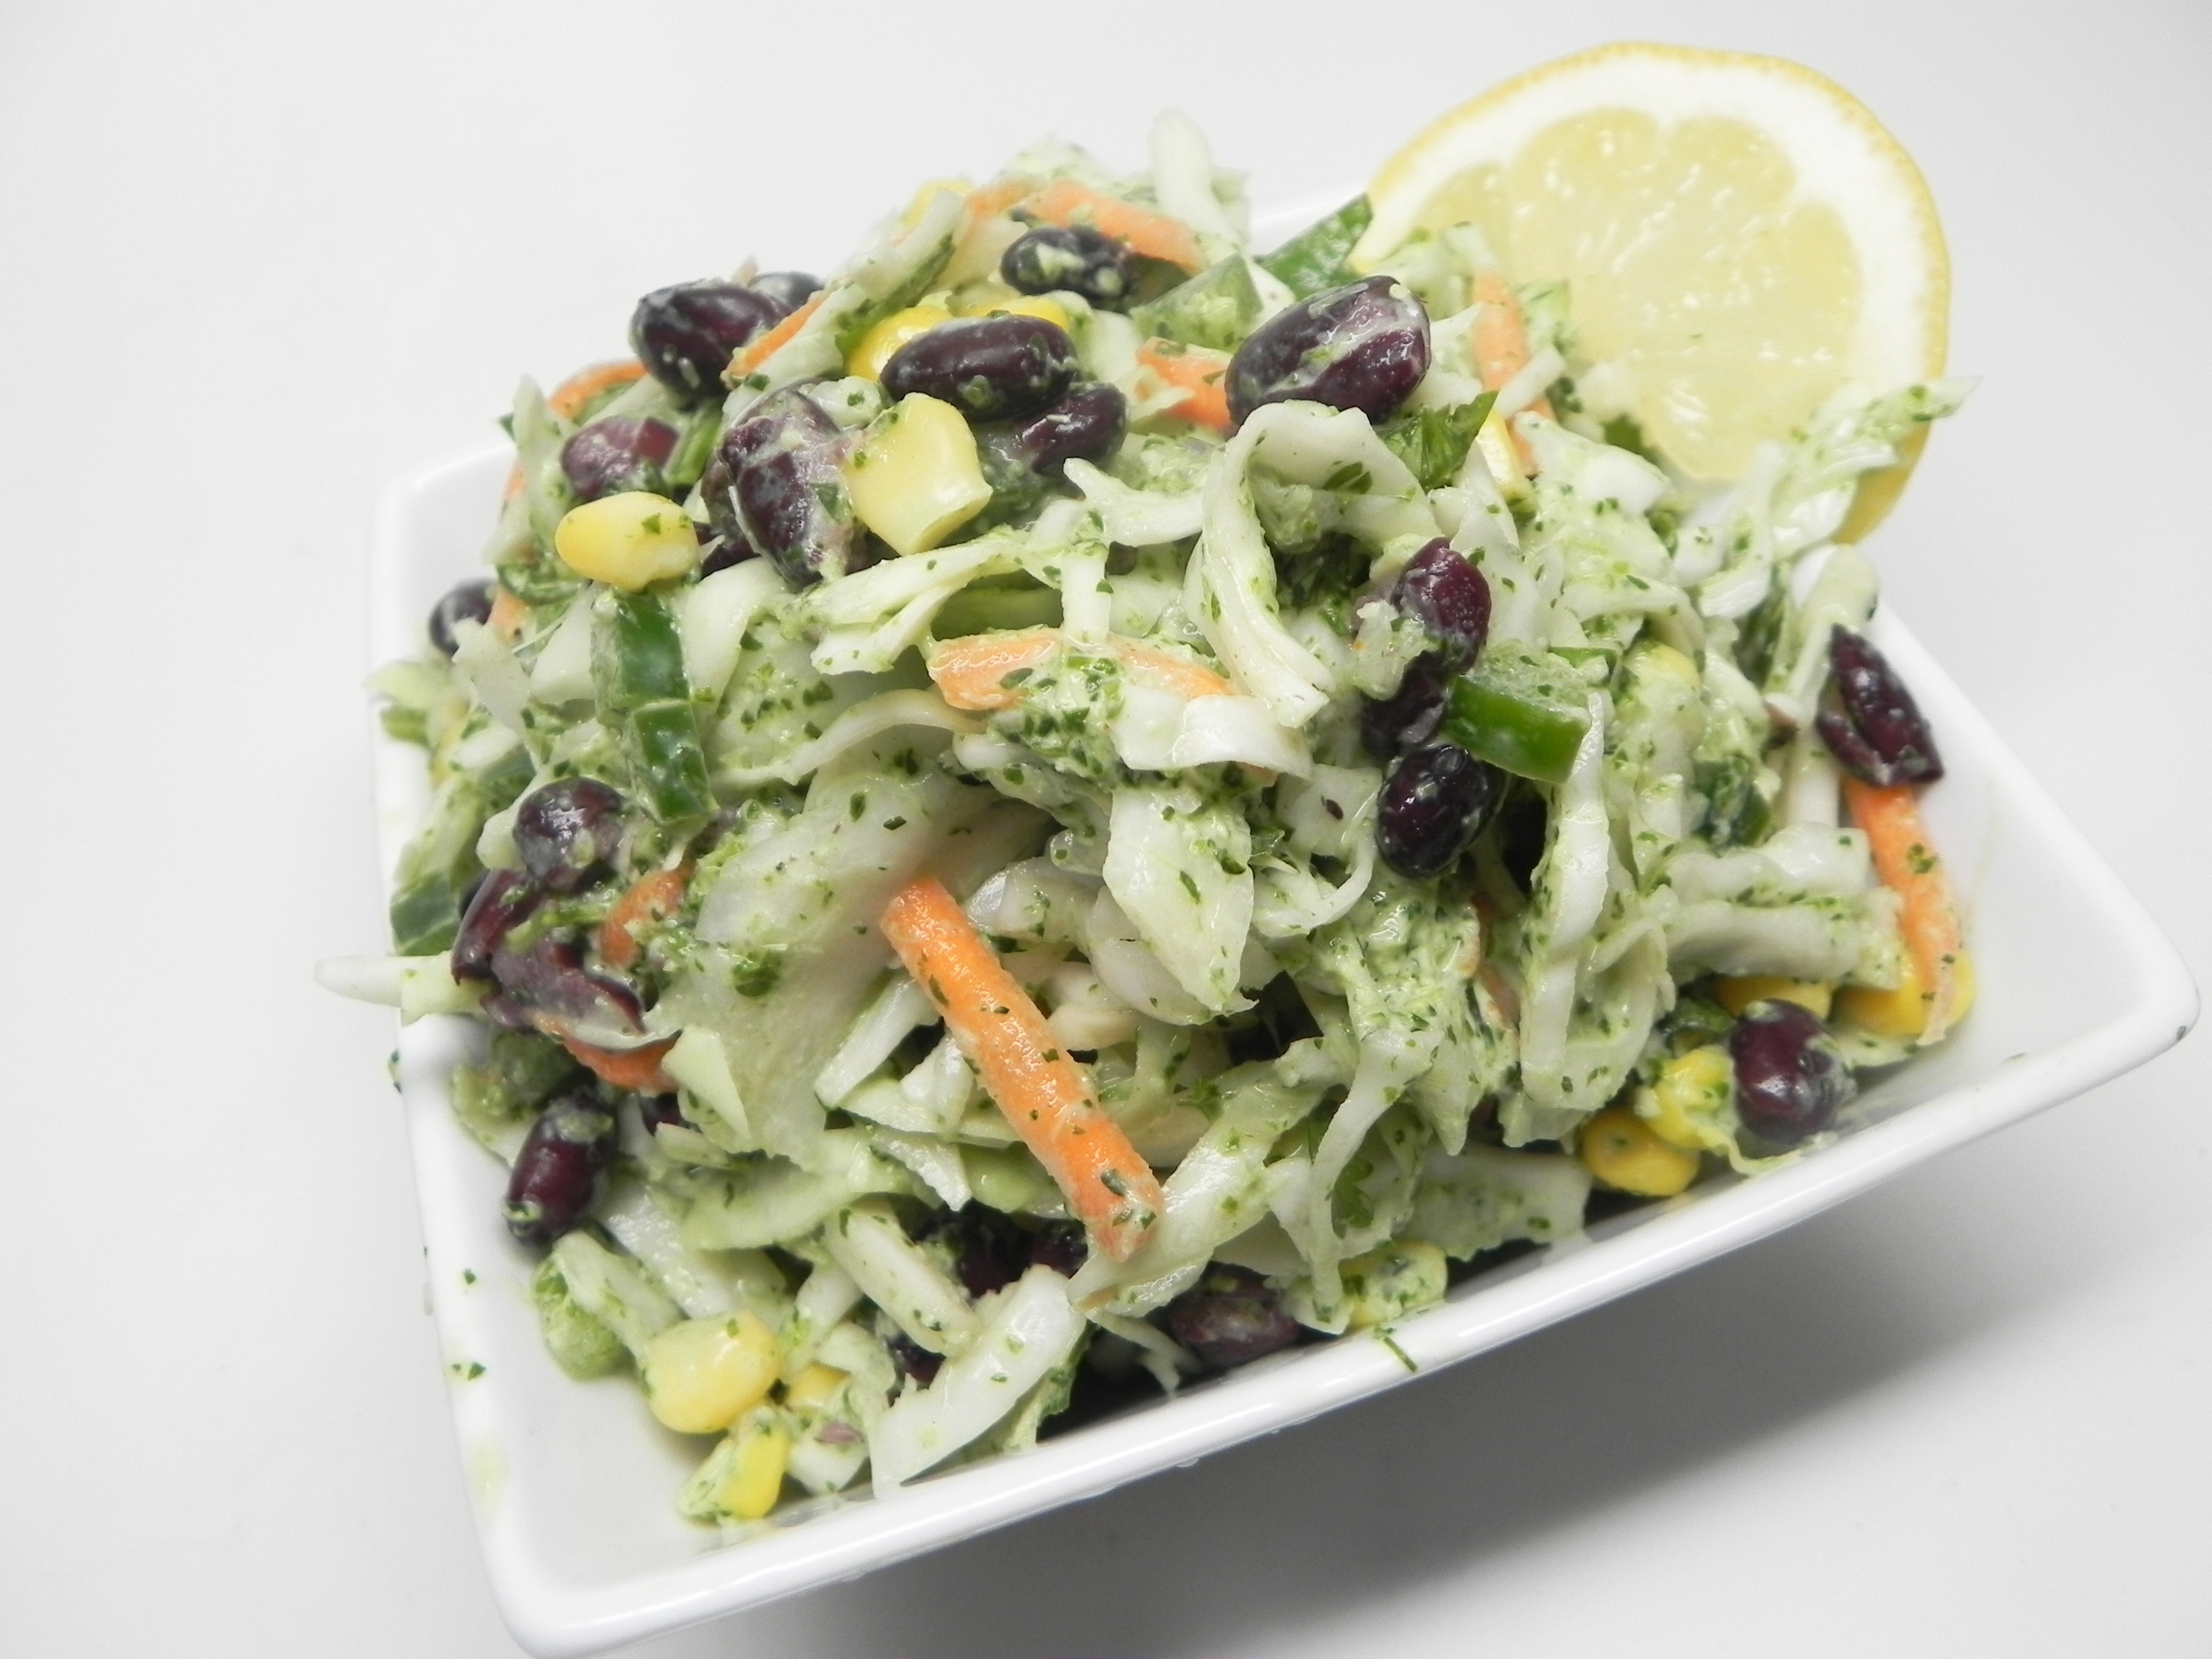 Vegetarian Taco Slaw with Creamy Cilantro-Lime Dressing